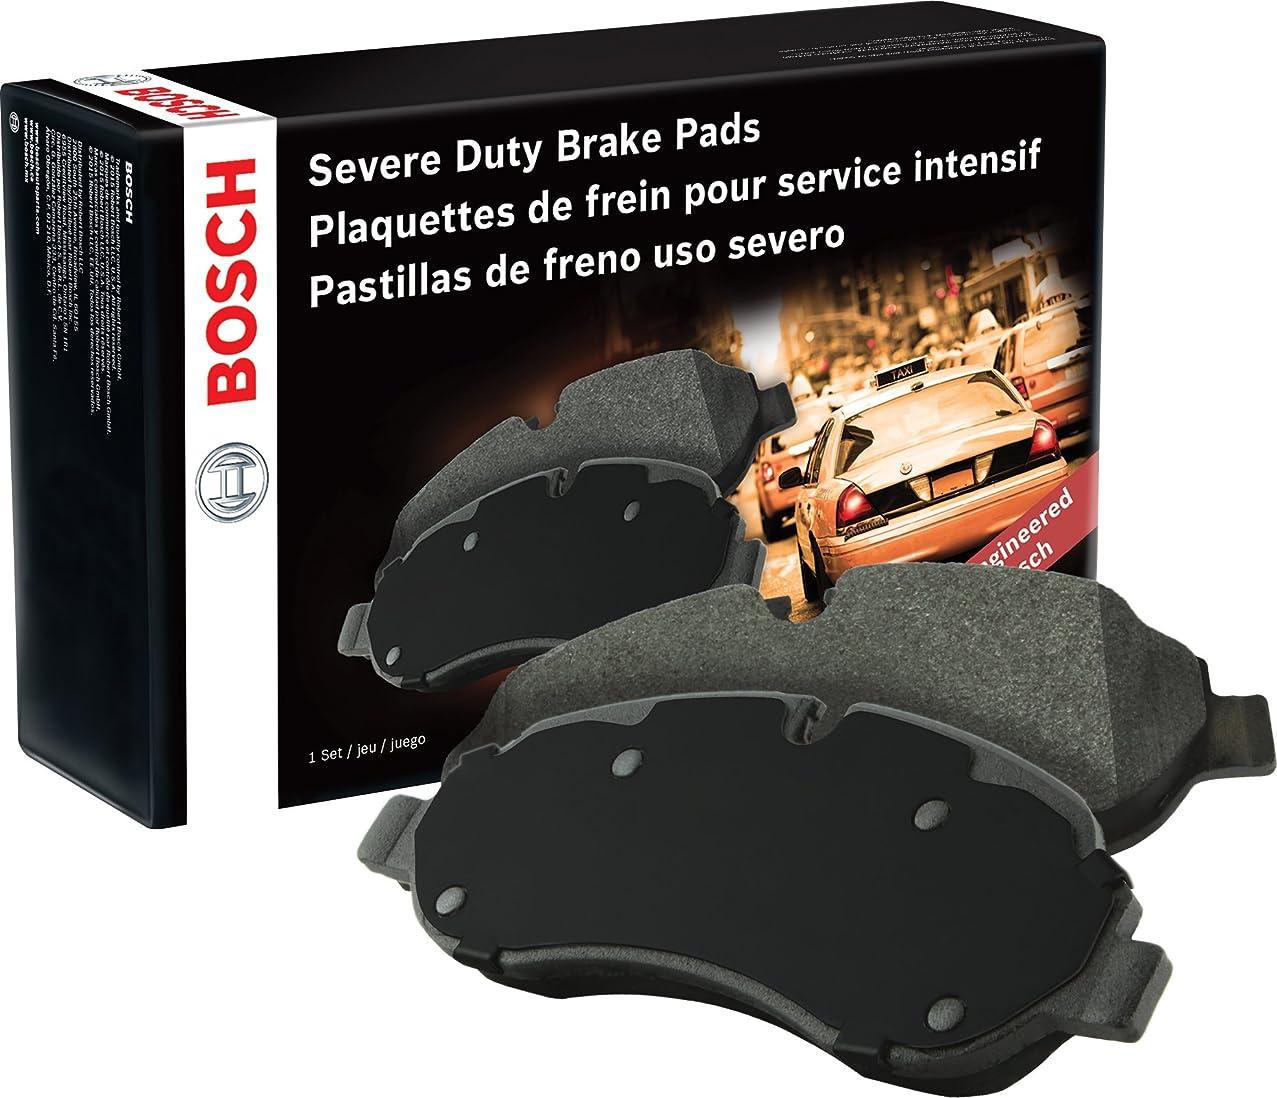 Bosch BSD803 SevereDuty 803 Severe Duty Disc Brake Pad